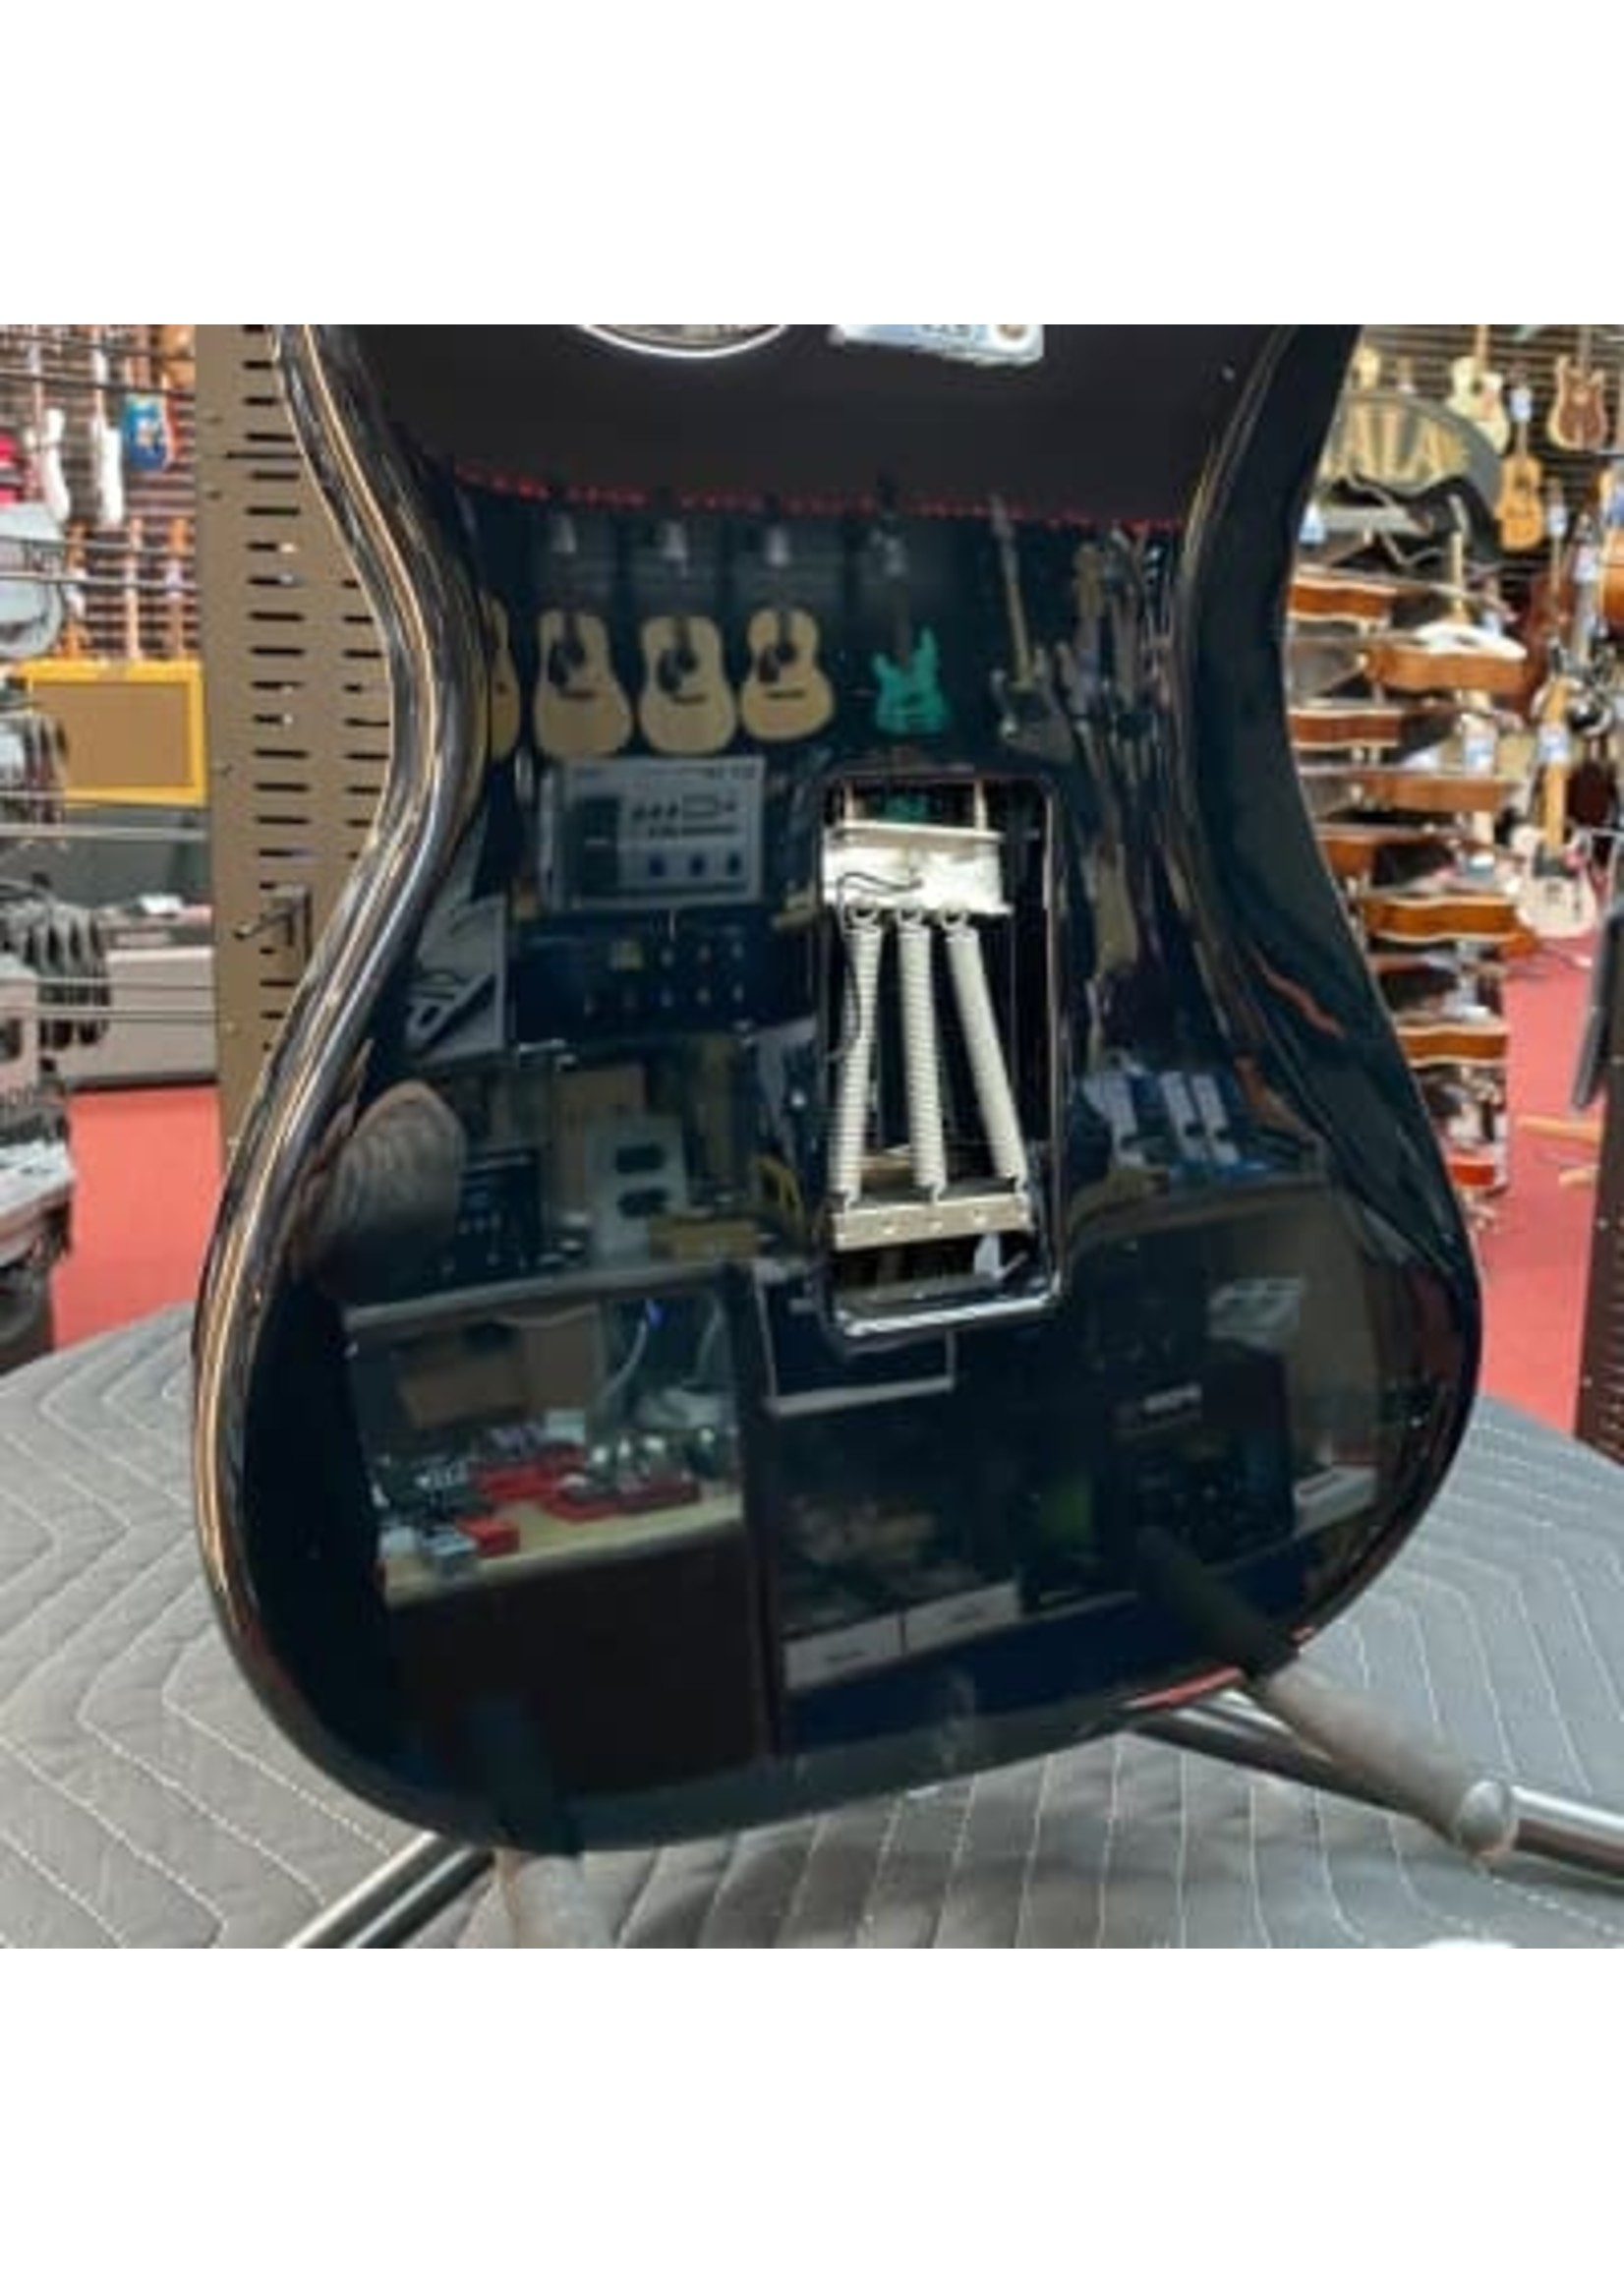 Fender Fender Tom Morello Stratocaster®, Rosewood Fingerboard, Black